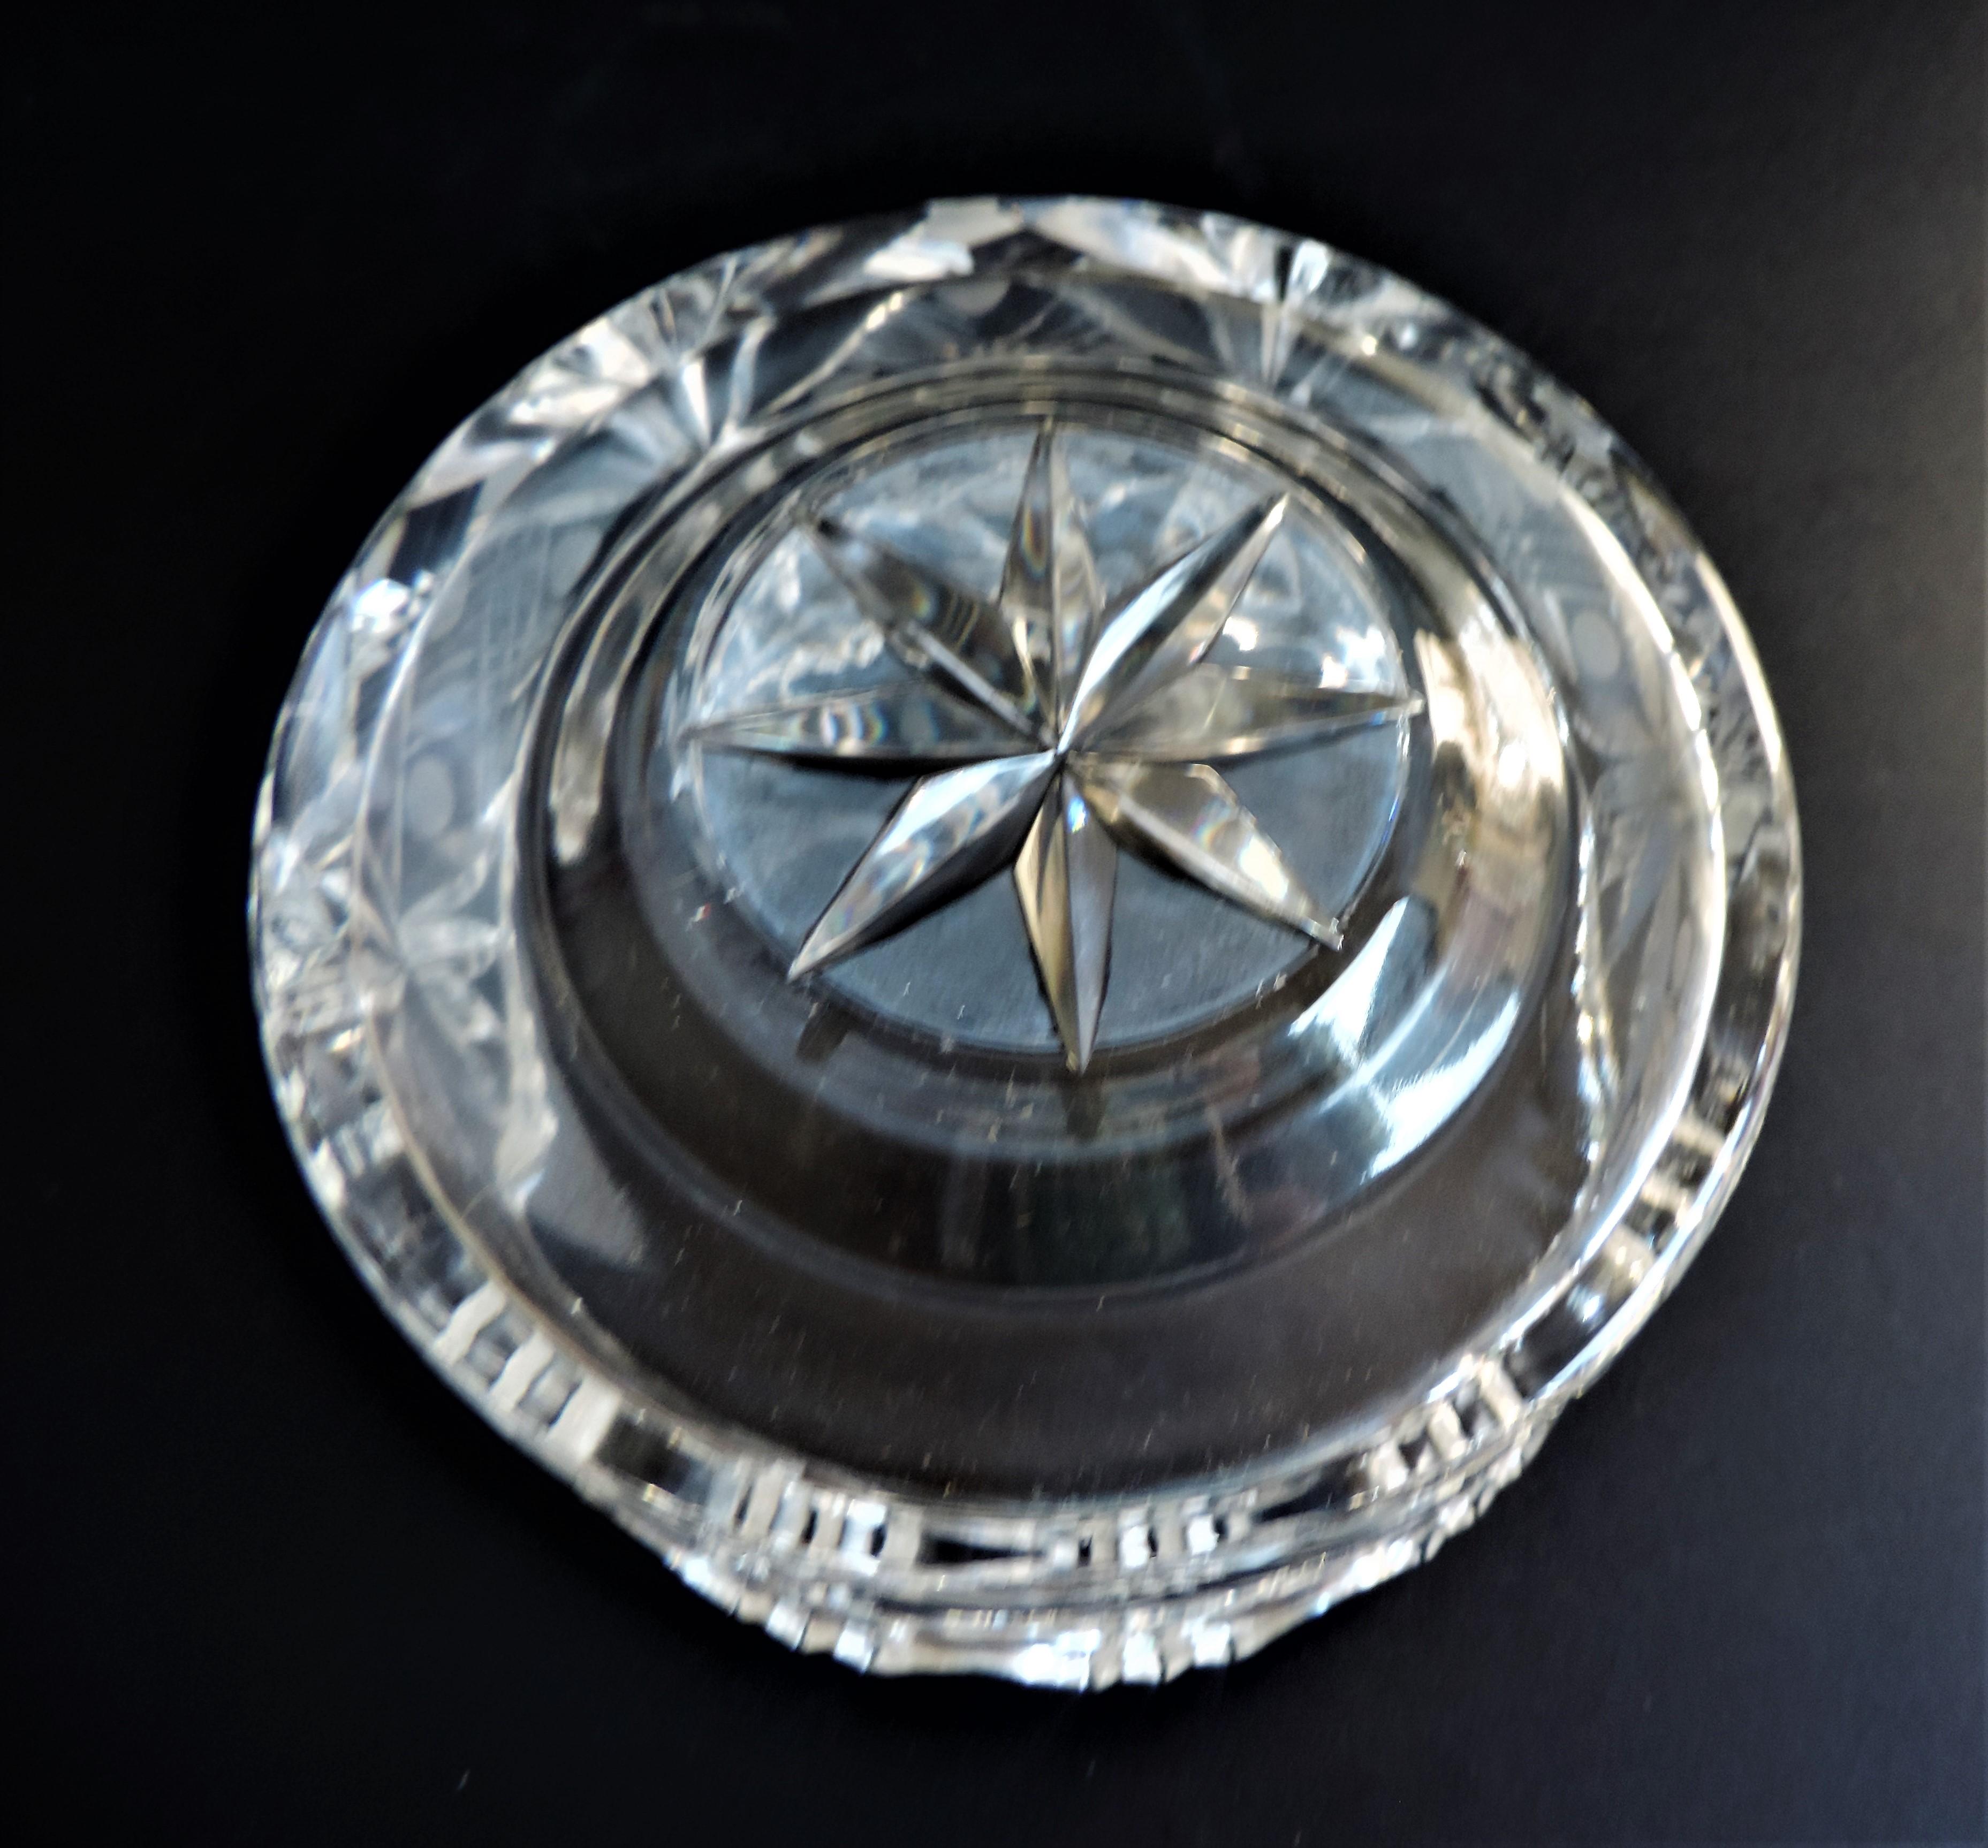 Vintage Bohemian Crystal Bowl - Image 3 of 4